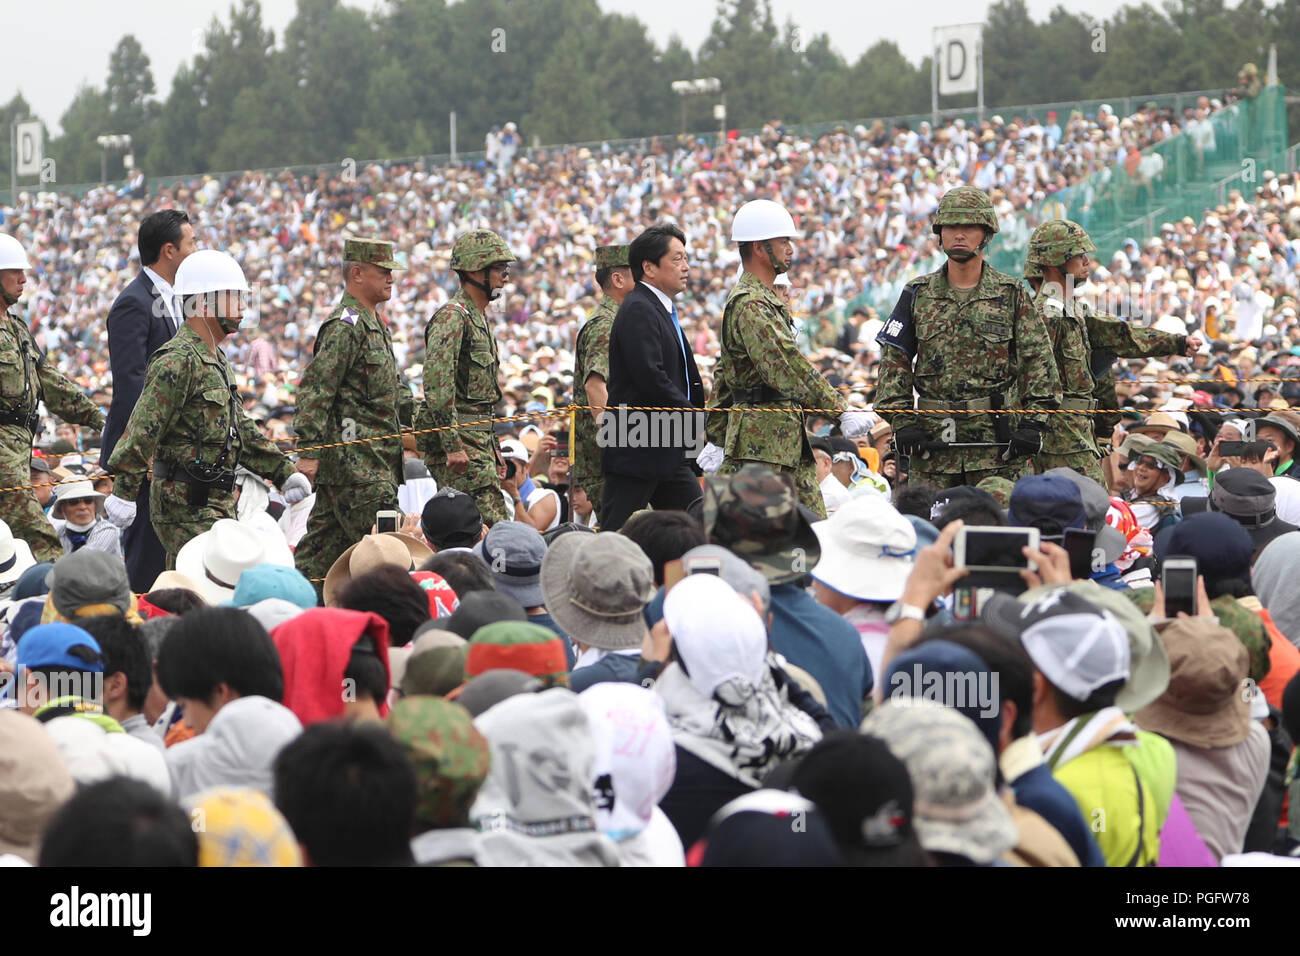 Gotemba, Japan. 26th Aug, 2018. Japanese Defense Minister Itsunori Onodera attends an annual live-fire military drill in Gotemba of Shizuoka prefecture, Japan, on Aug. 26, 2018. Credit: Du Xiaoyi/Xinhua/Alamy Live News Stock Photo